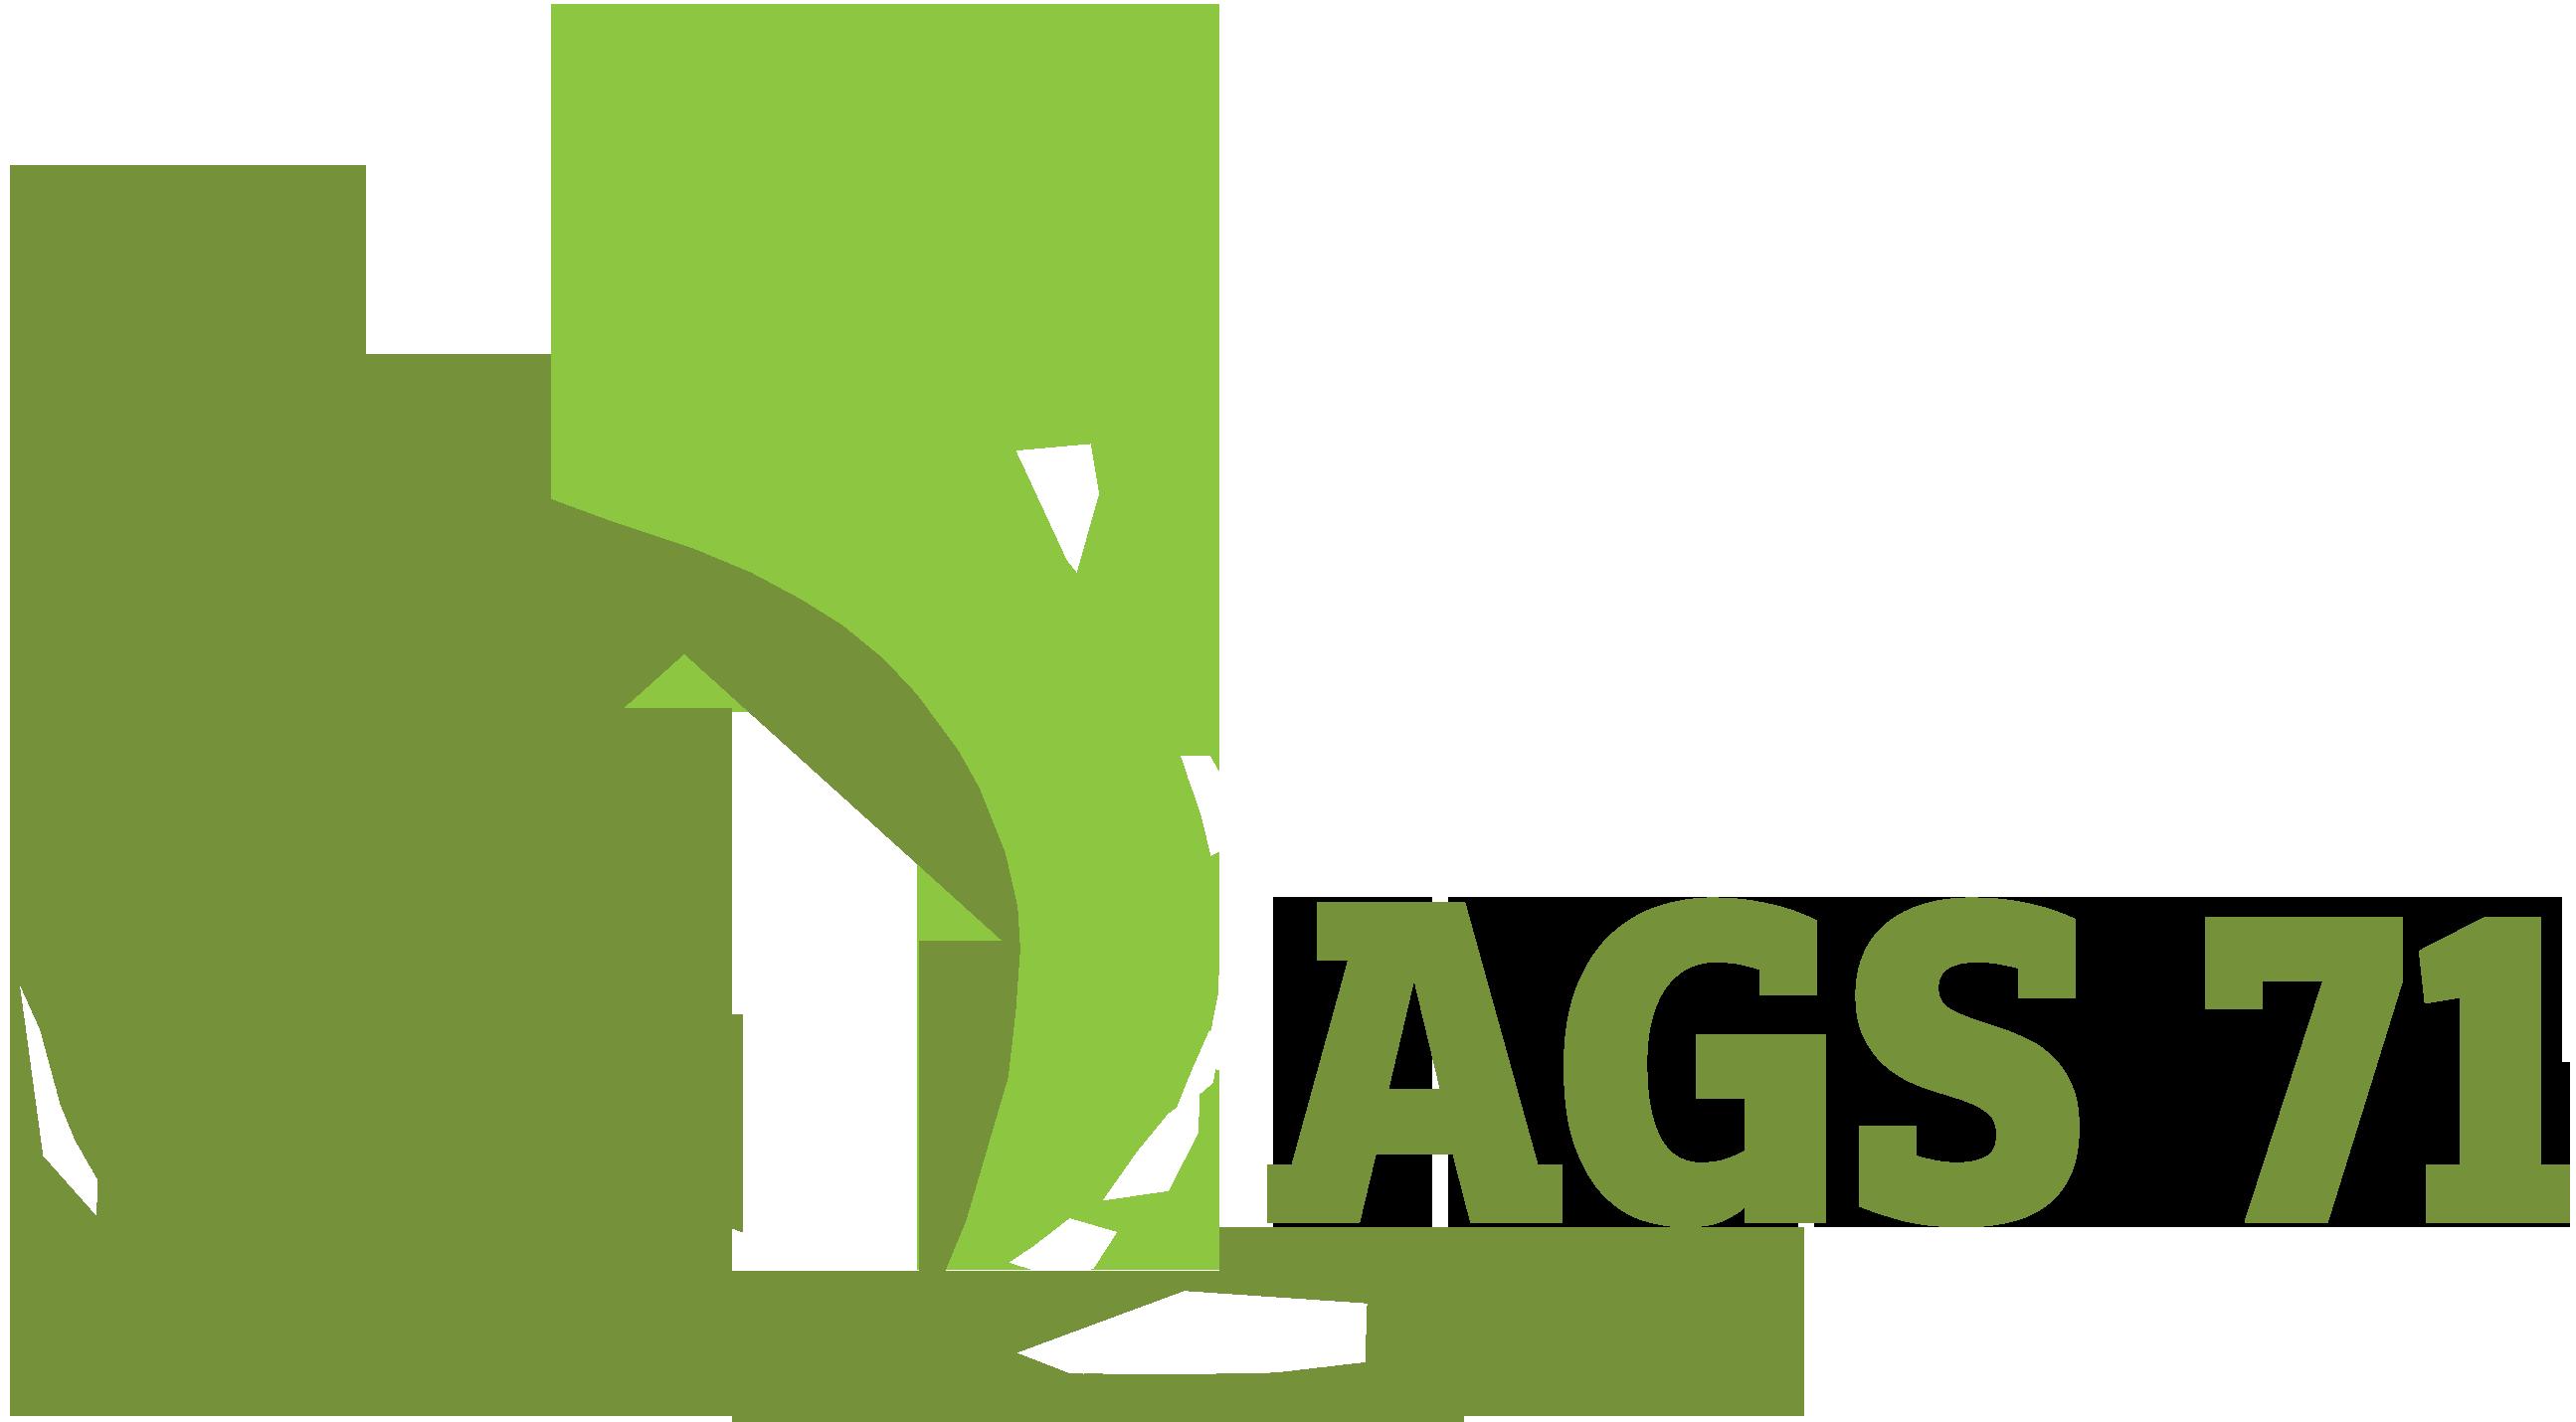 Ags71 - Svijet elektronike